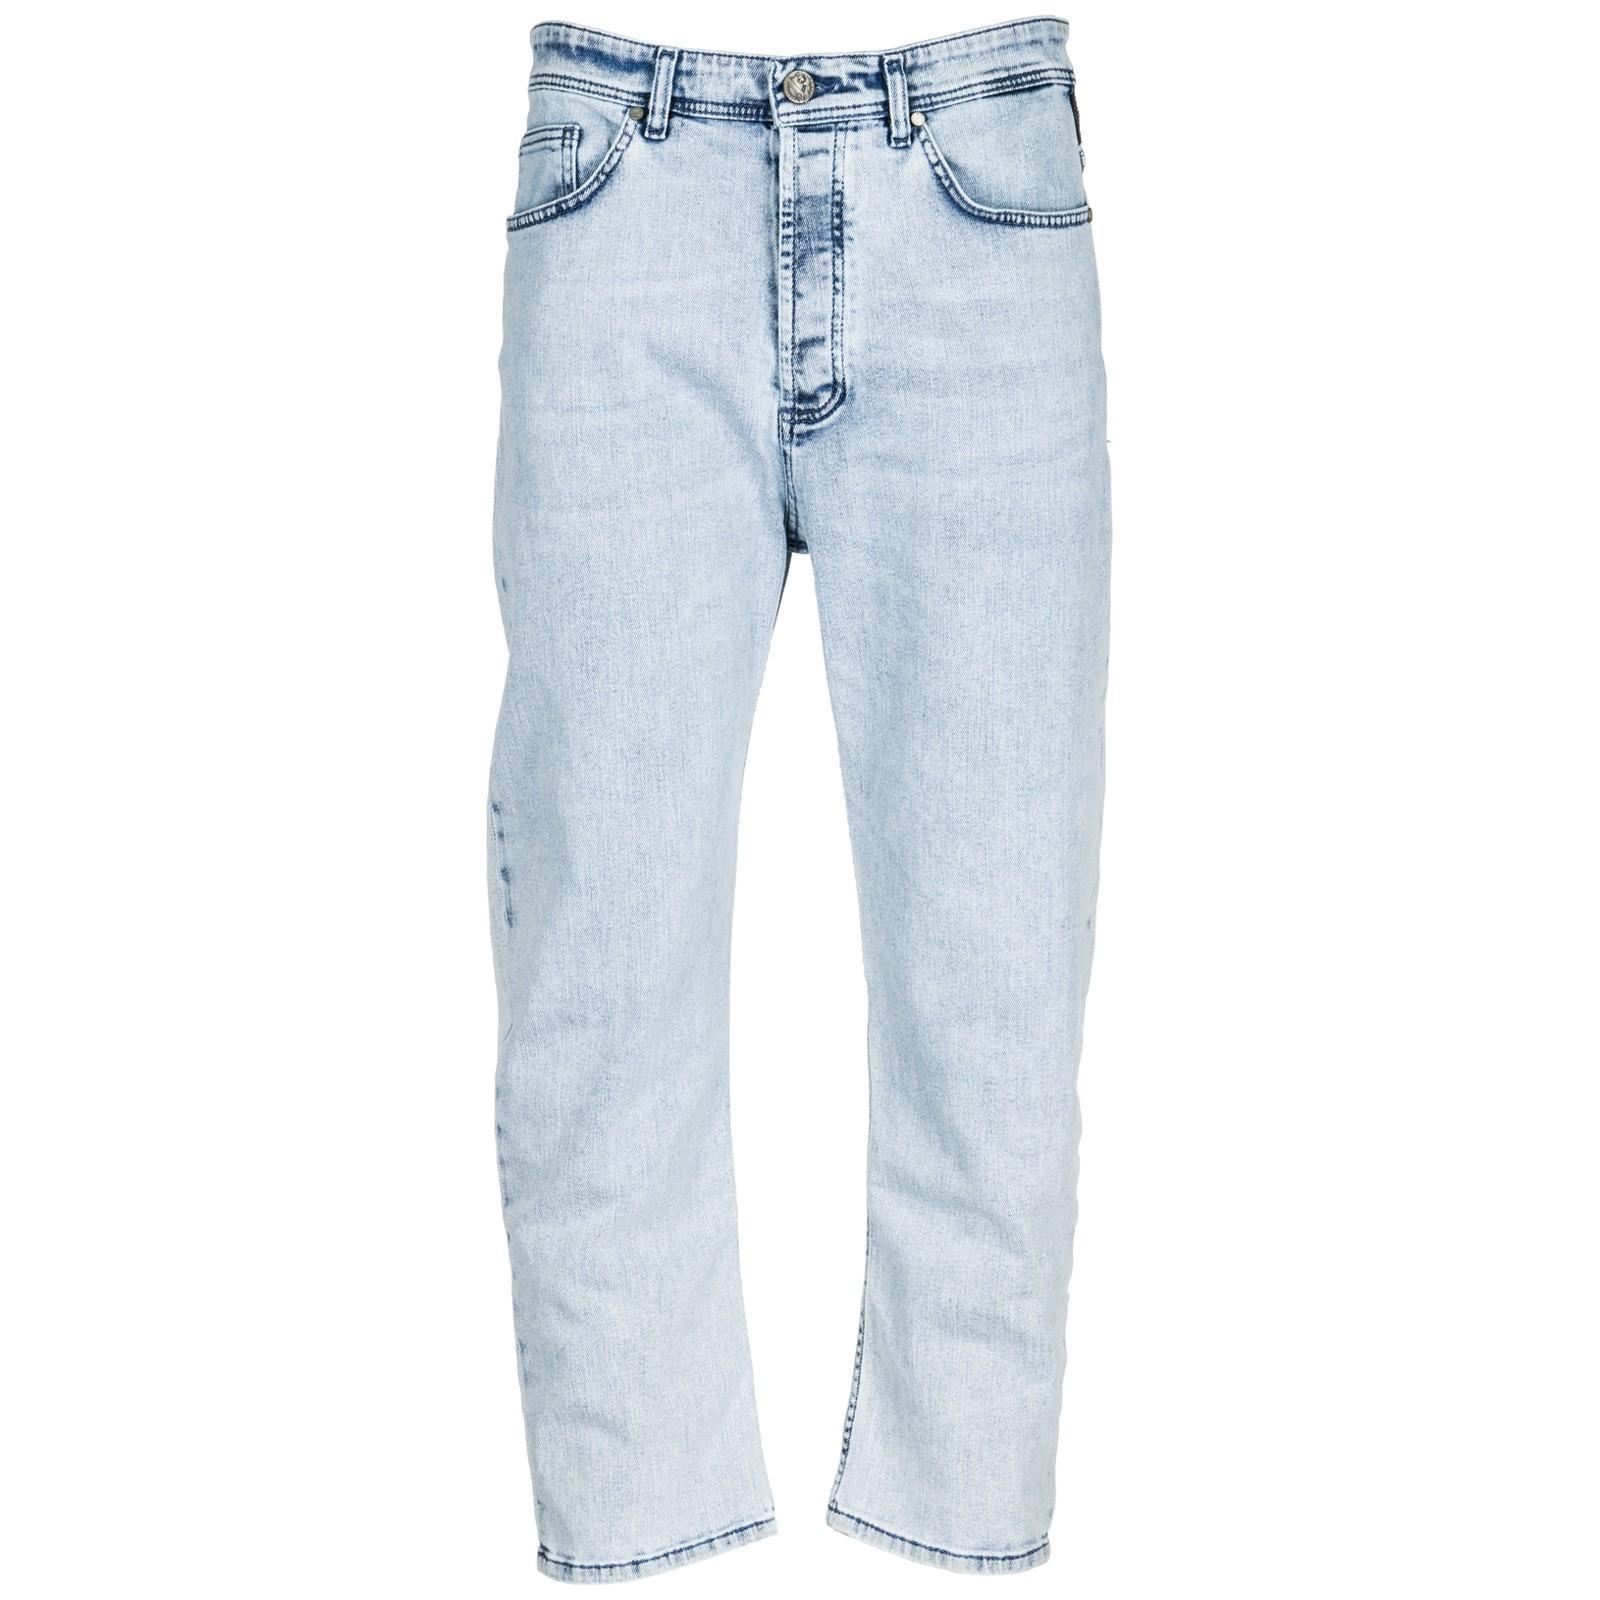 Versace Jeans Men's Jeans Denim In Blue